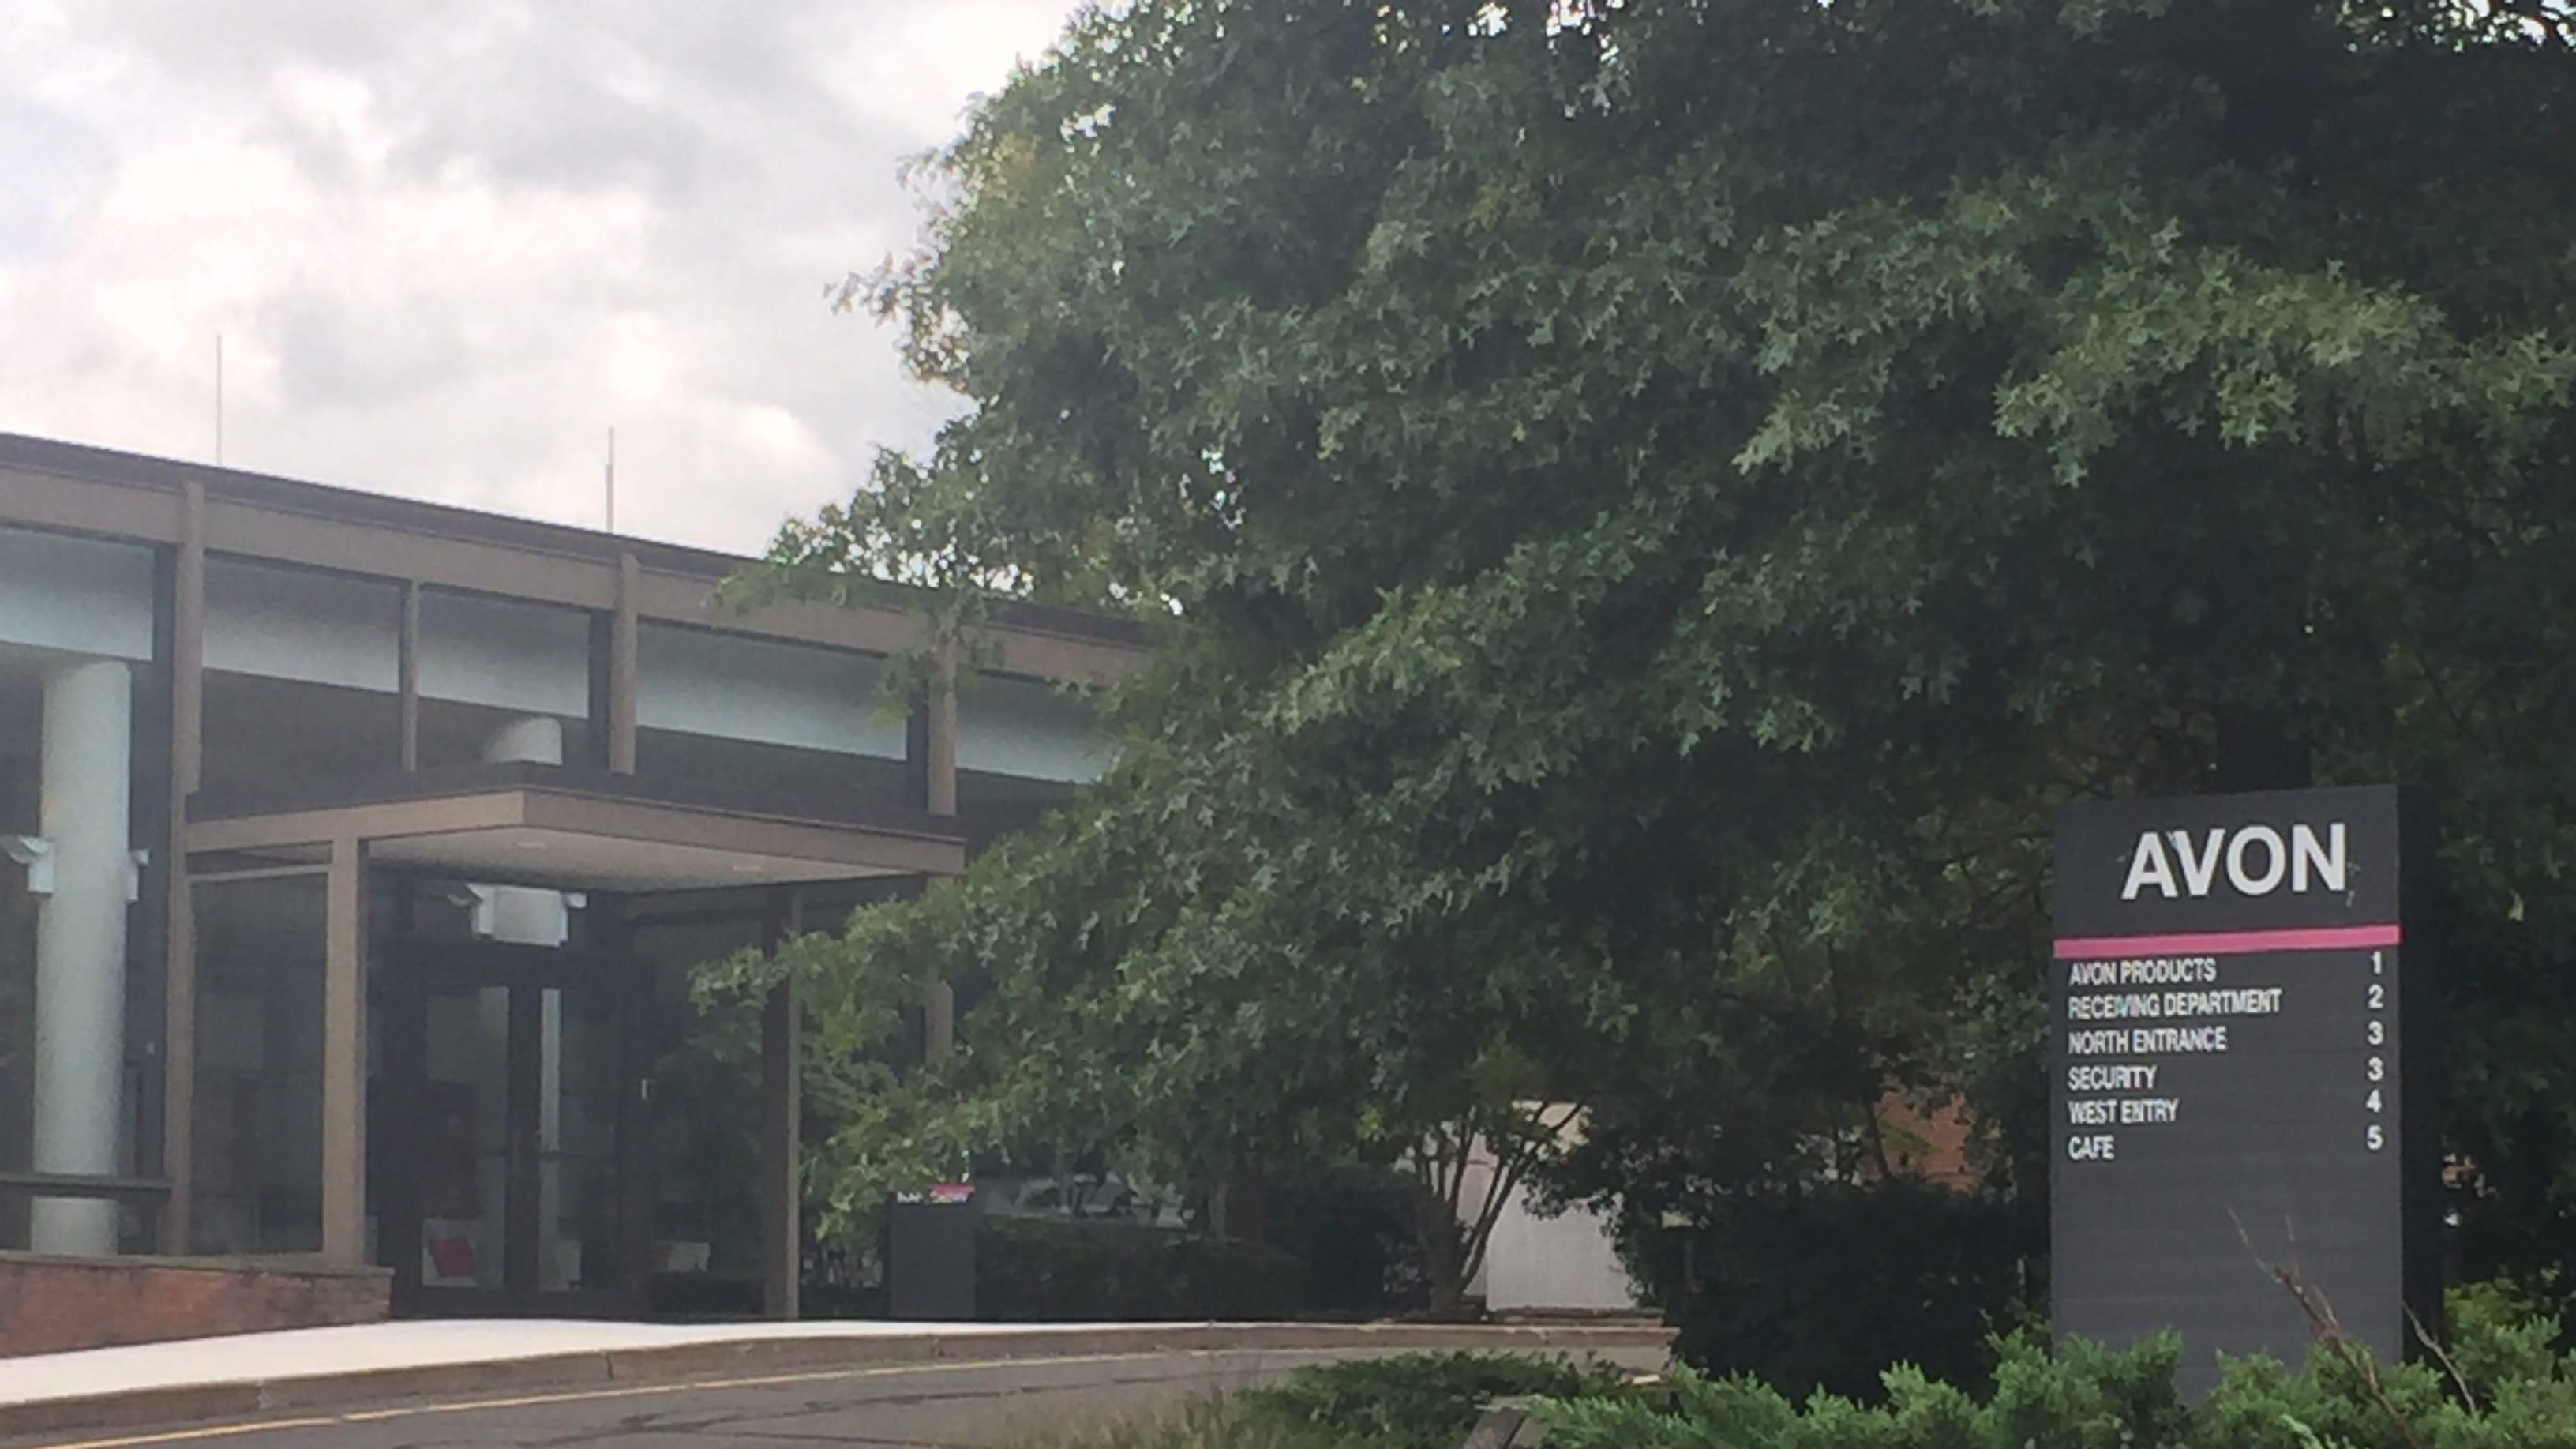 Avon closing Rye plant, laying off 105 employees